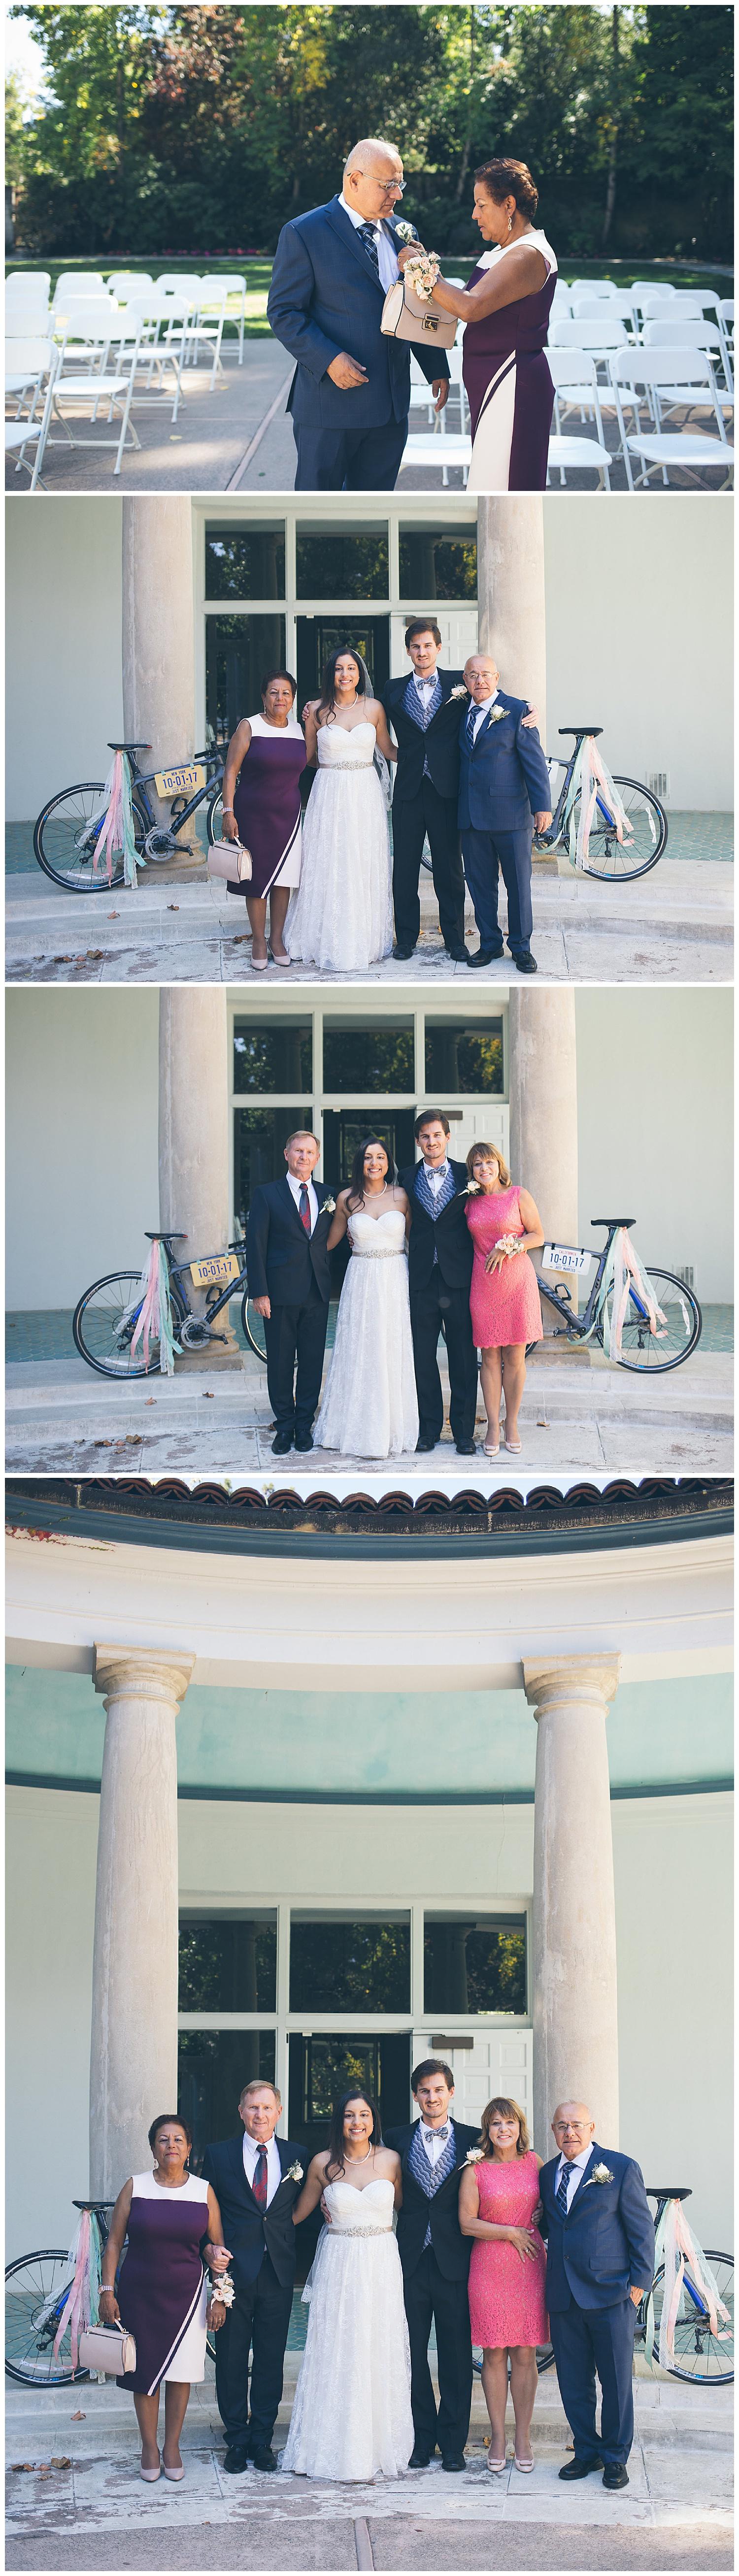 khariza-rae-photography-bay-area-wedding-photographer_0156.jpg